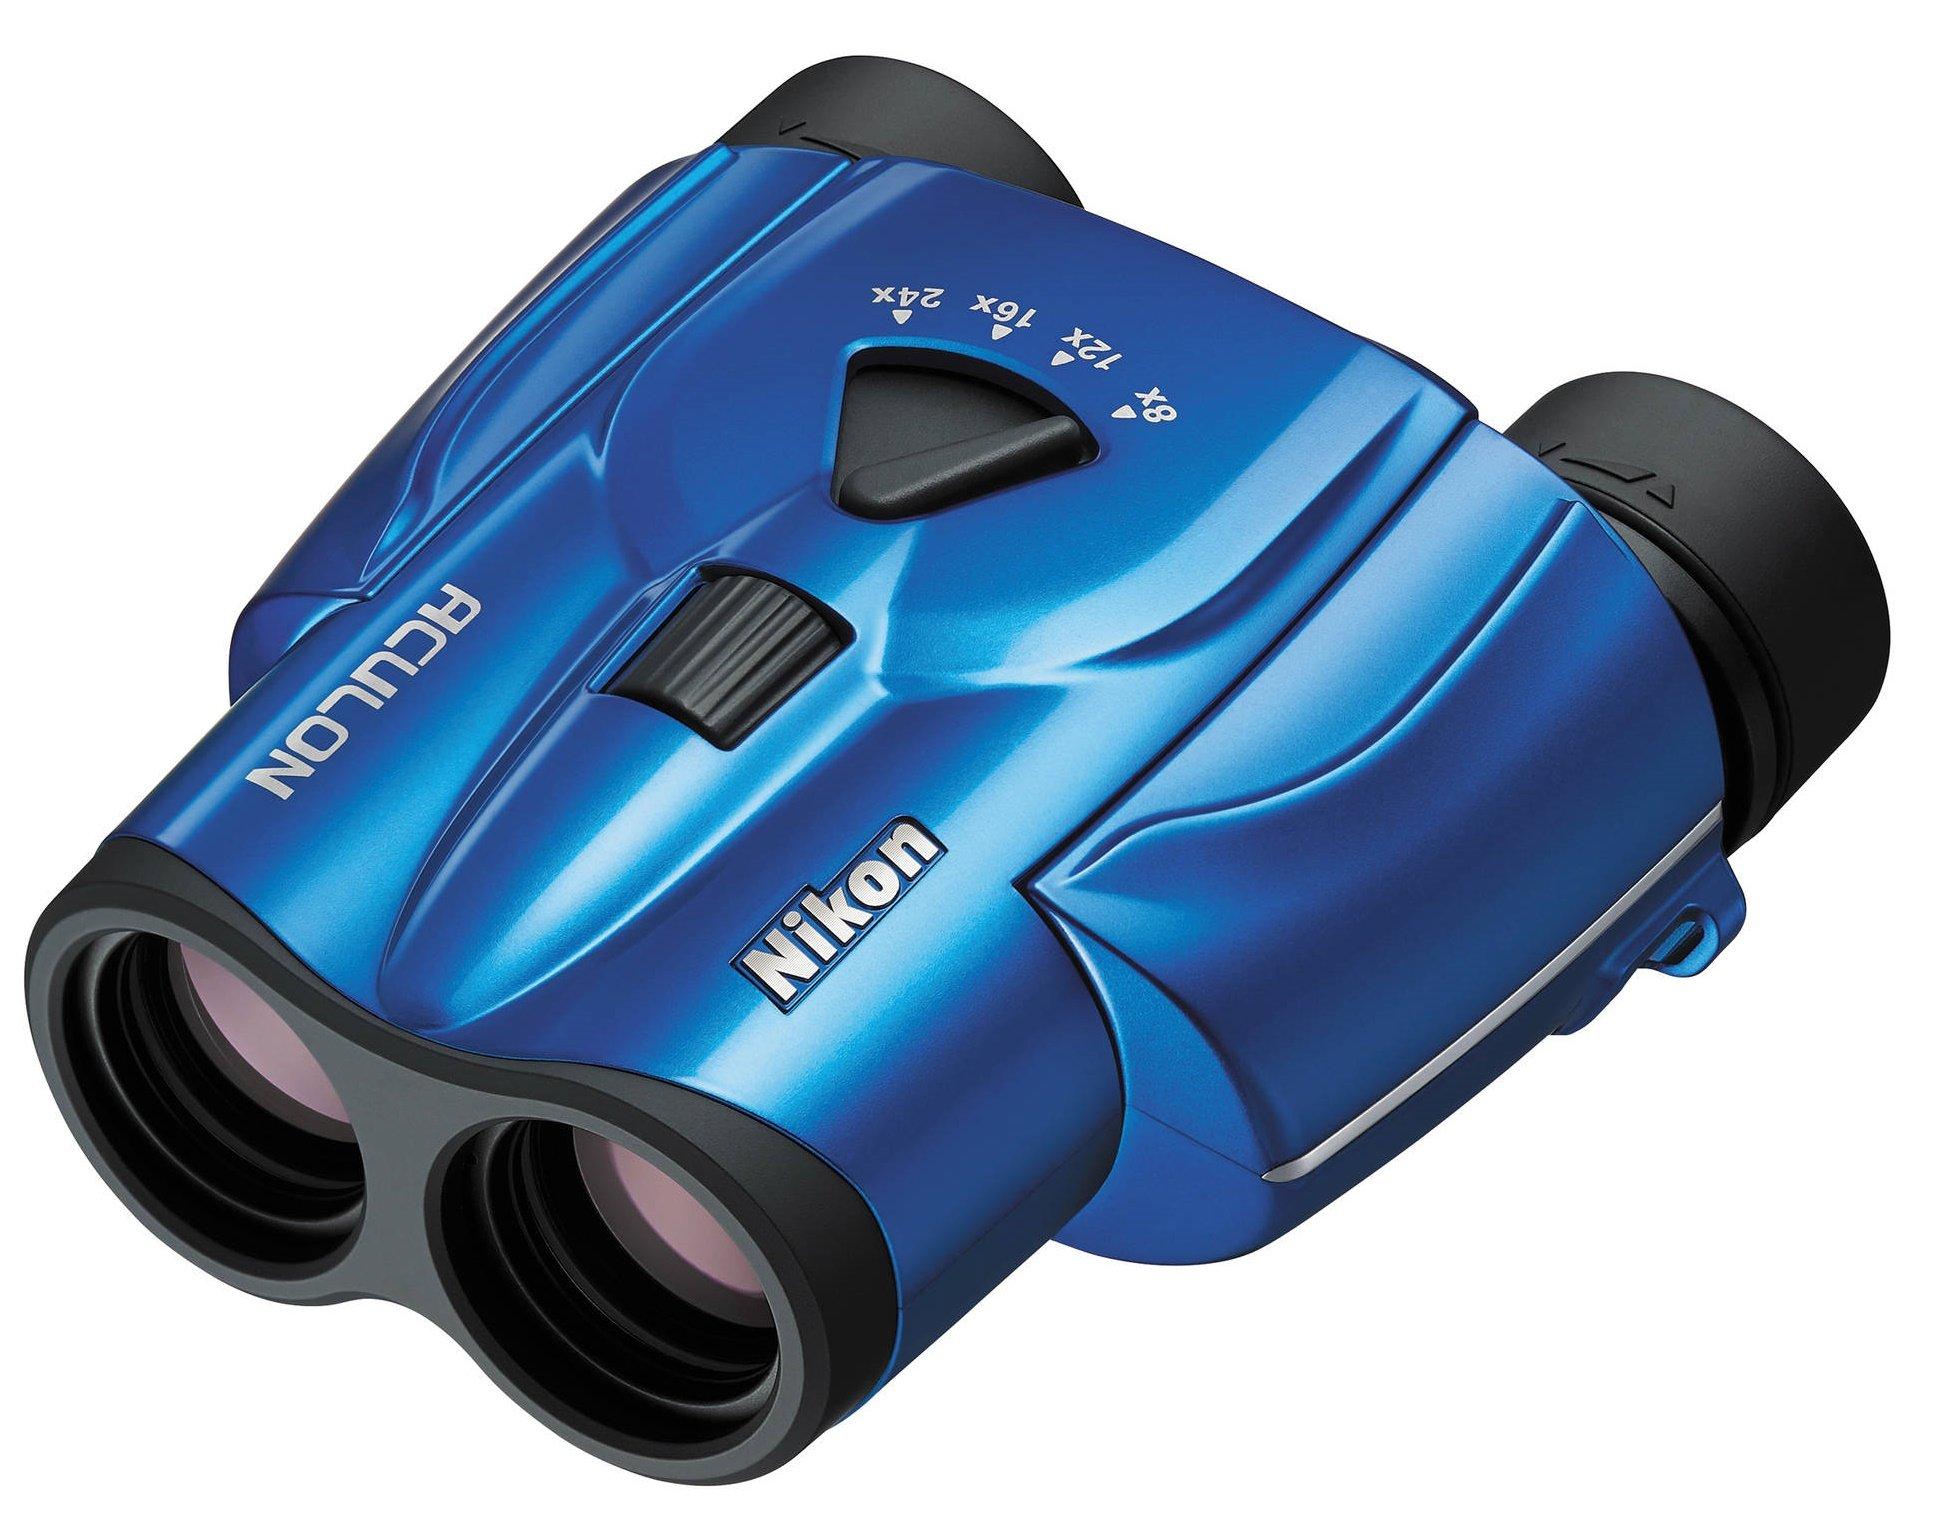 NIKON 8-24x25 ACULON T11 ZOOM modrý - dalekohled